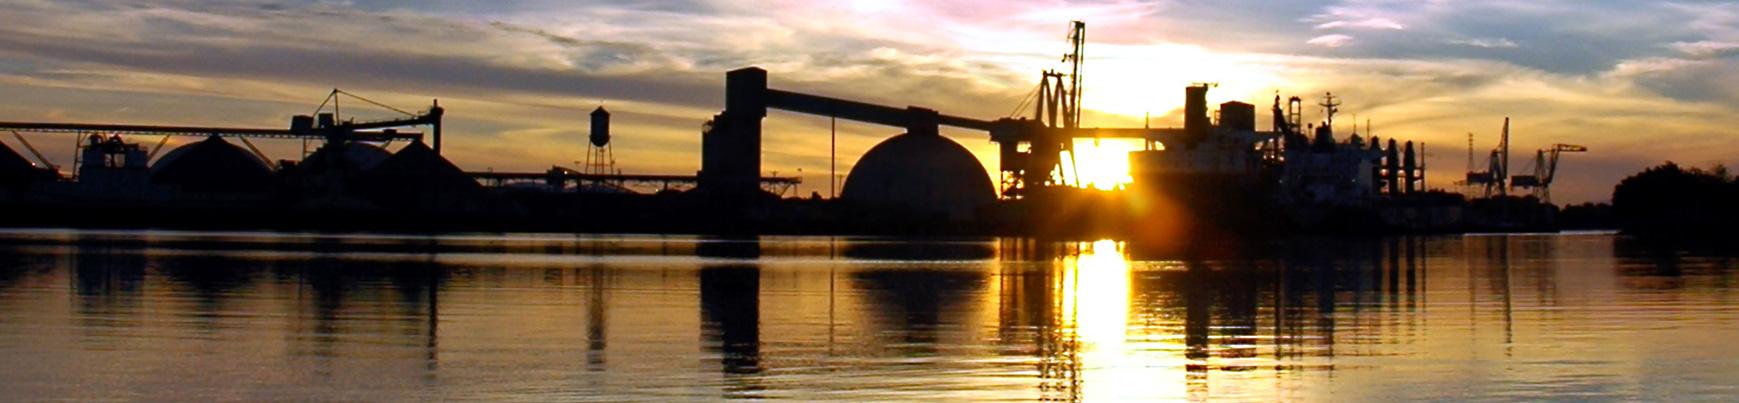 Sun setting over the Port of Stockton